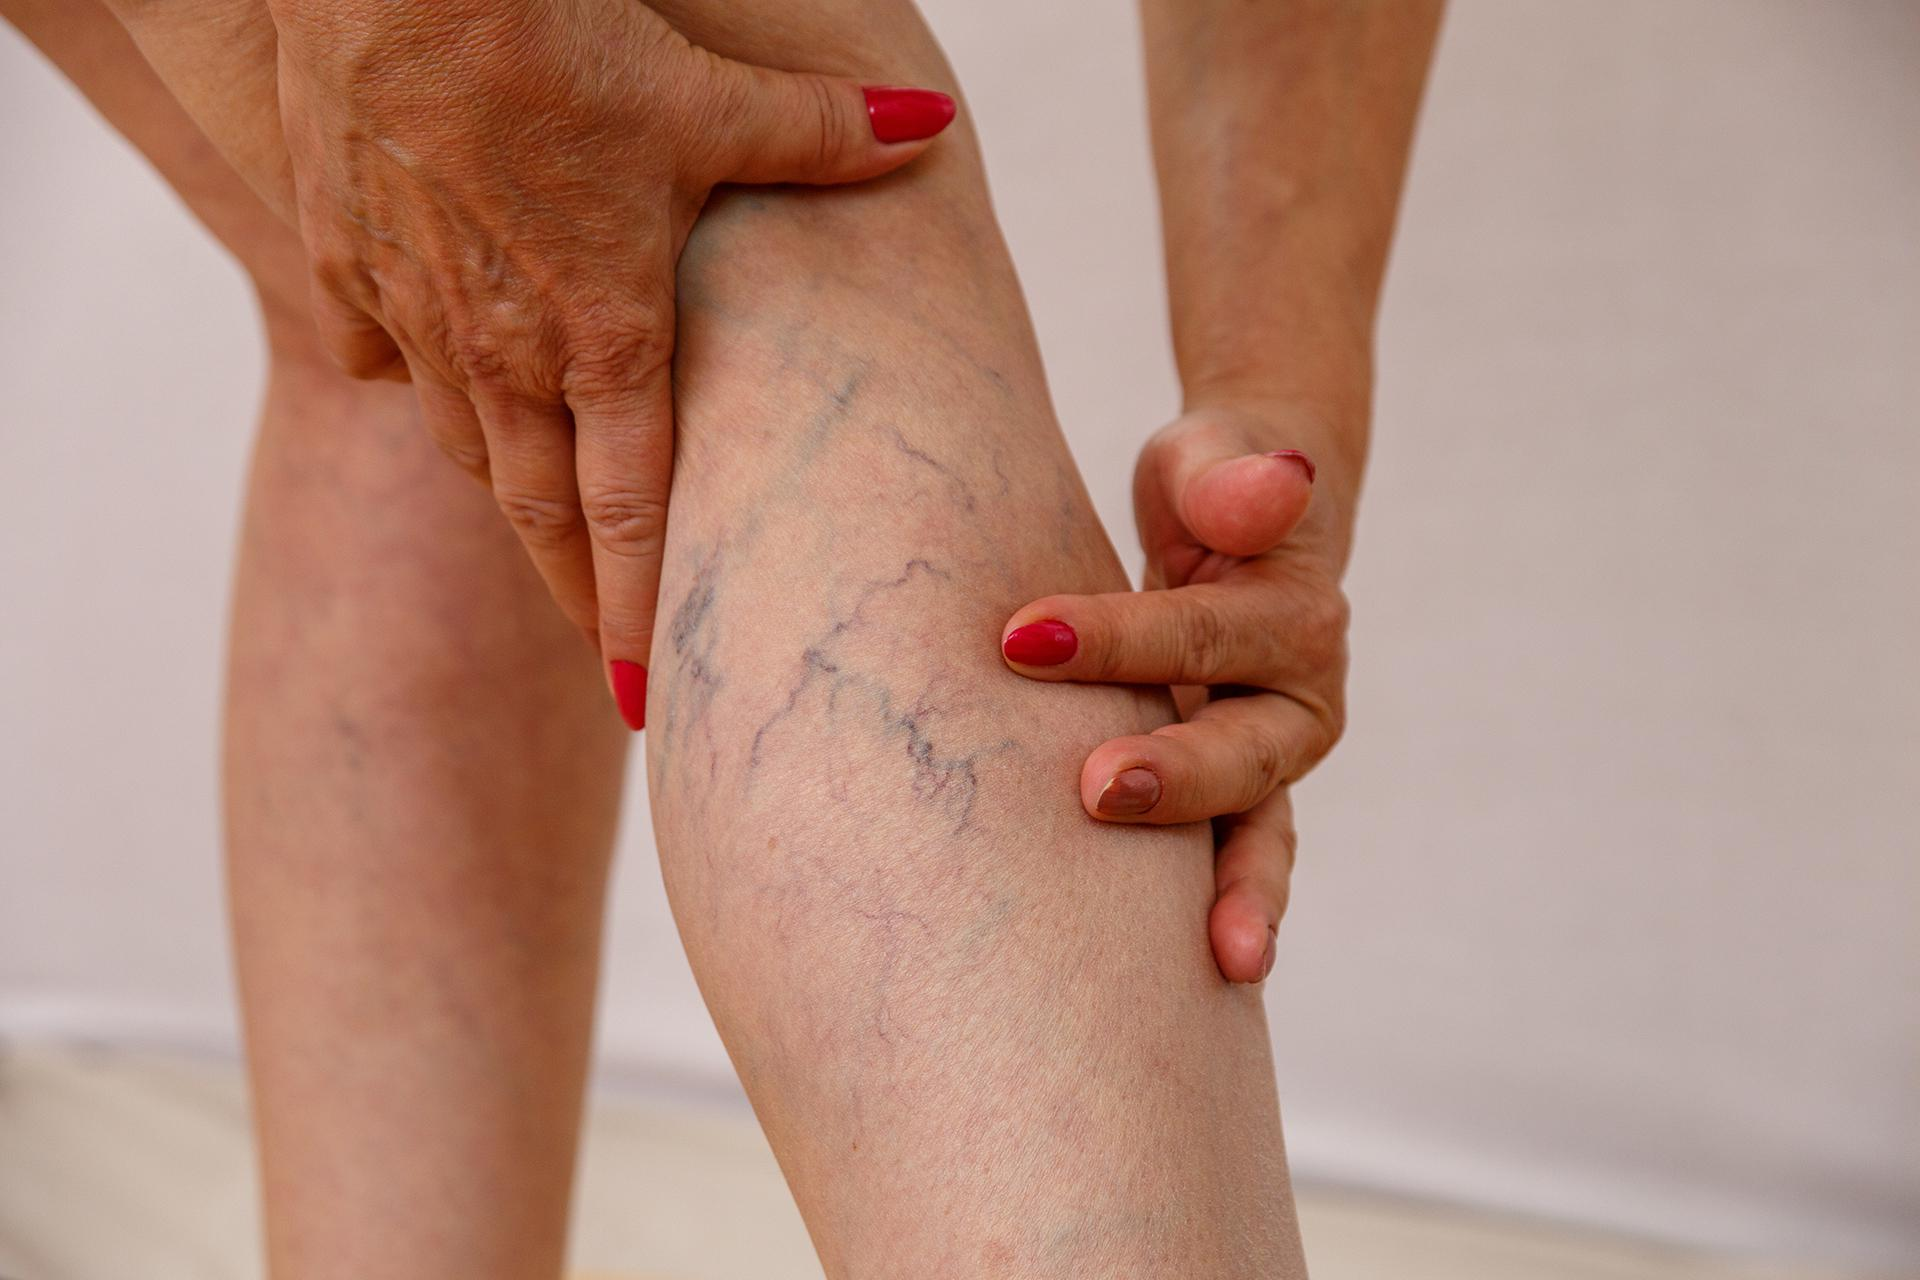 vascular-issues-requiring-leg-pain-doctor-Playa-del-Rey